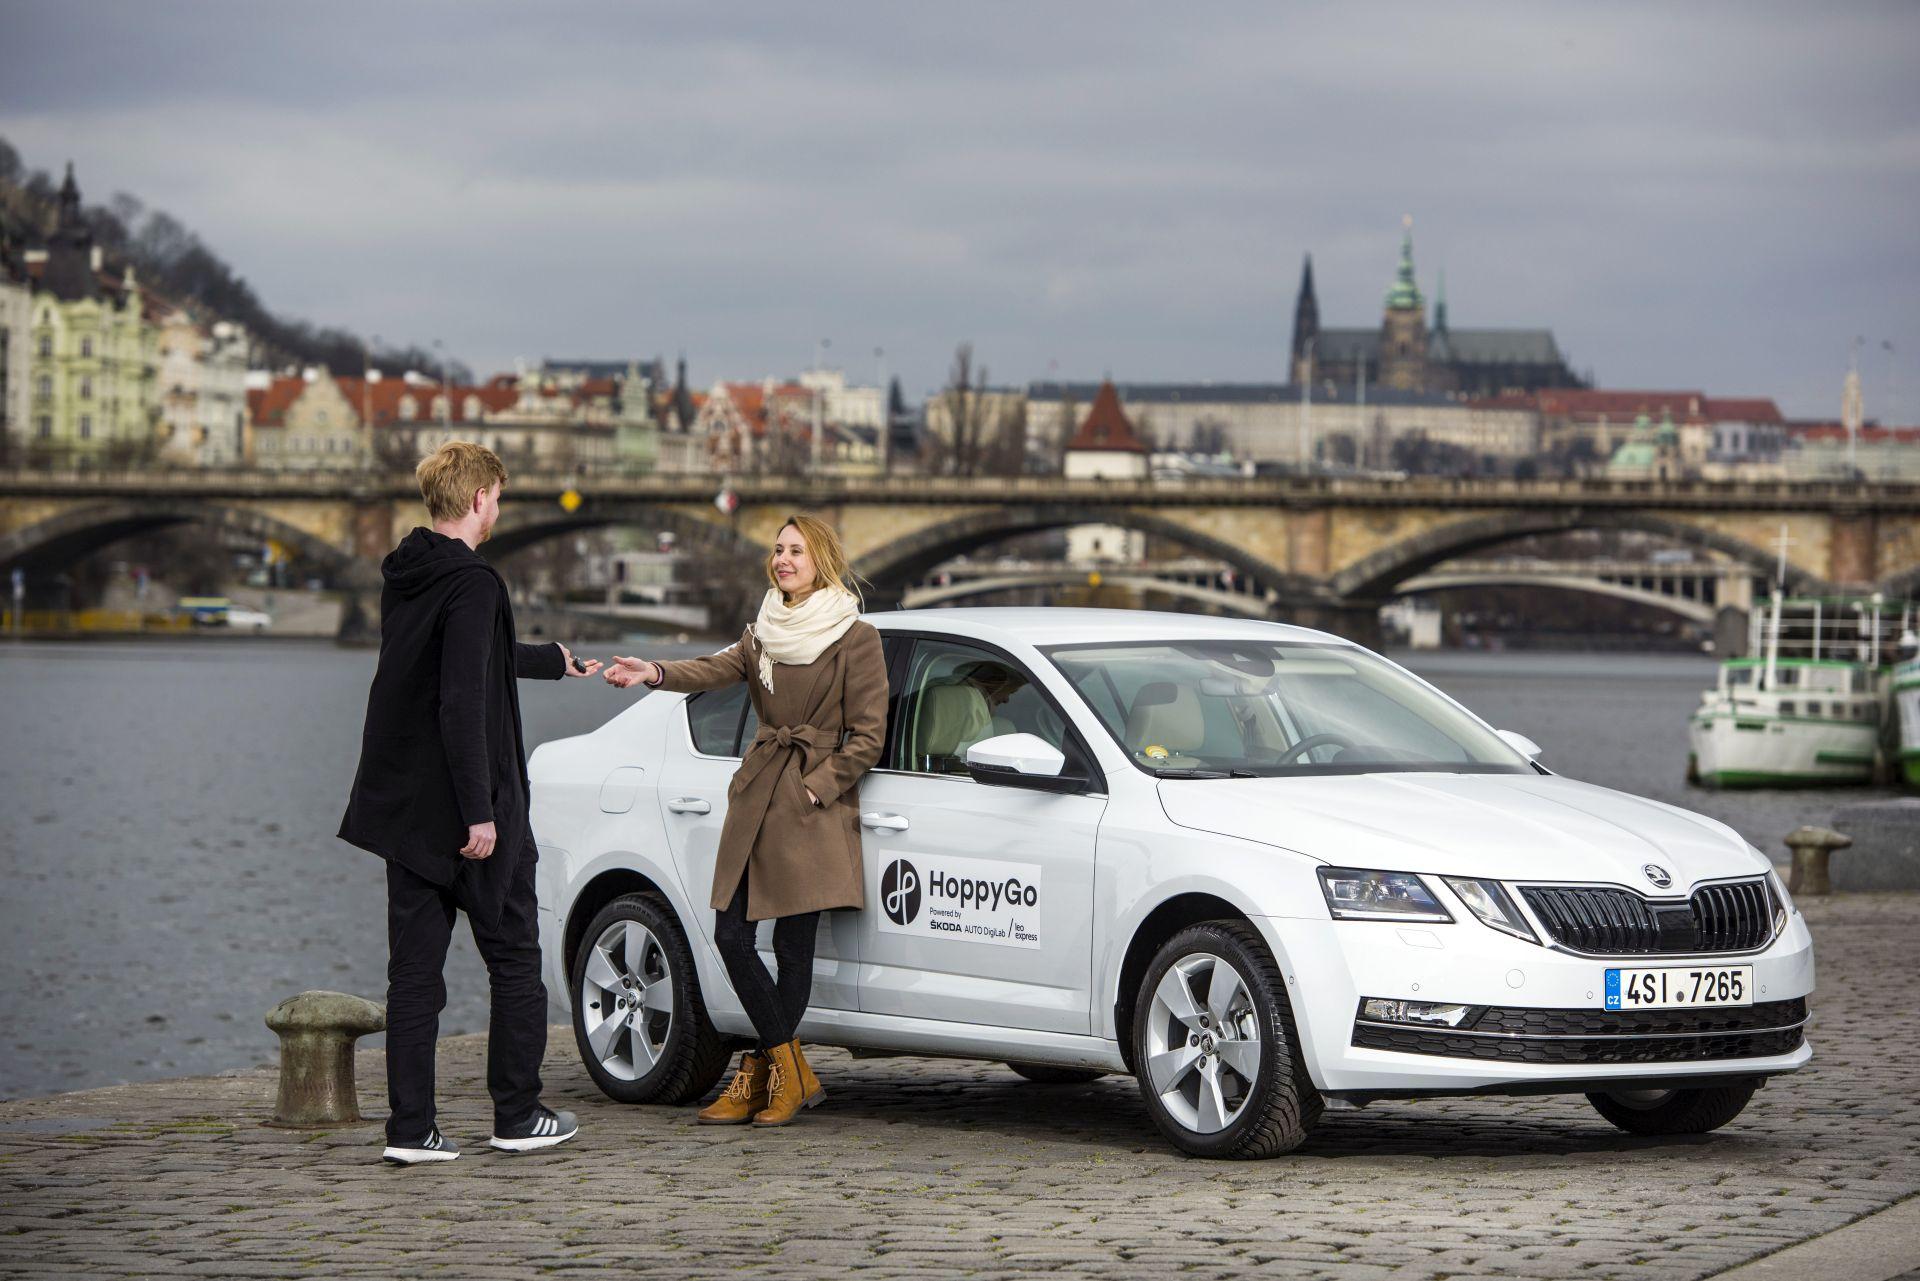 Nový společný podnik Škody Auto a Leo Express bude pod značkou HoppyGo. Foto: Škoda Auto